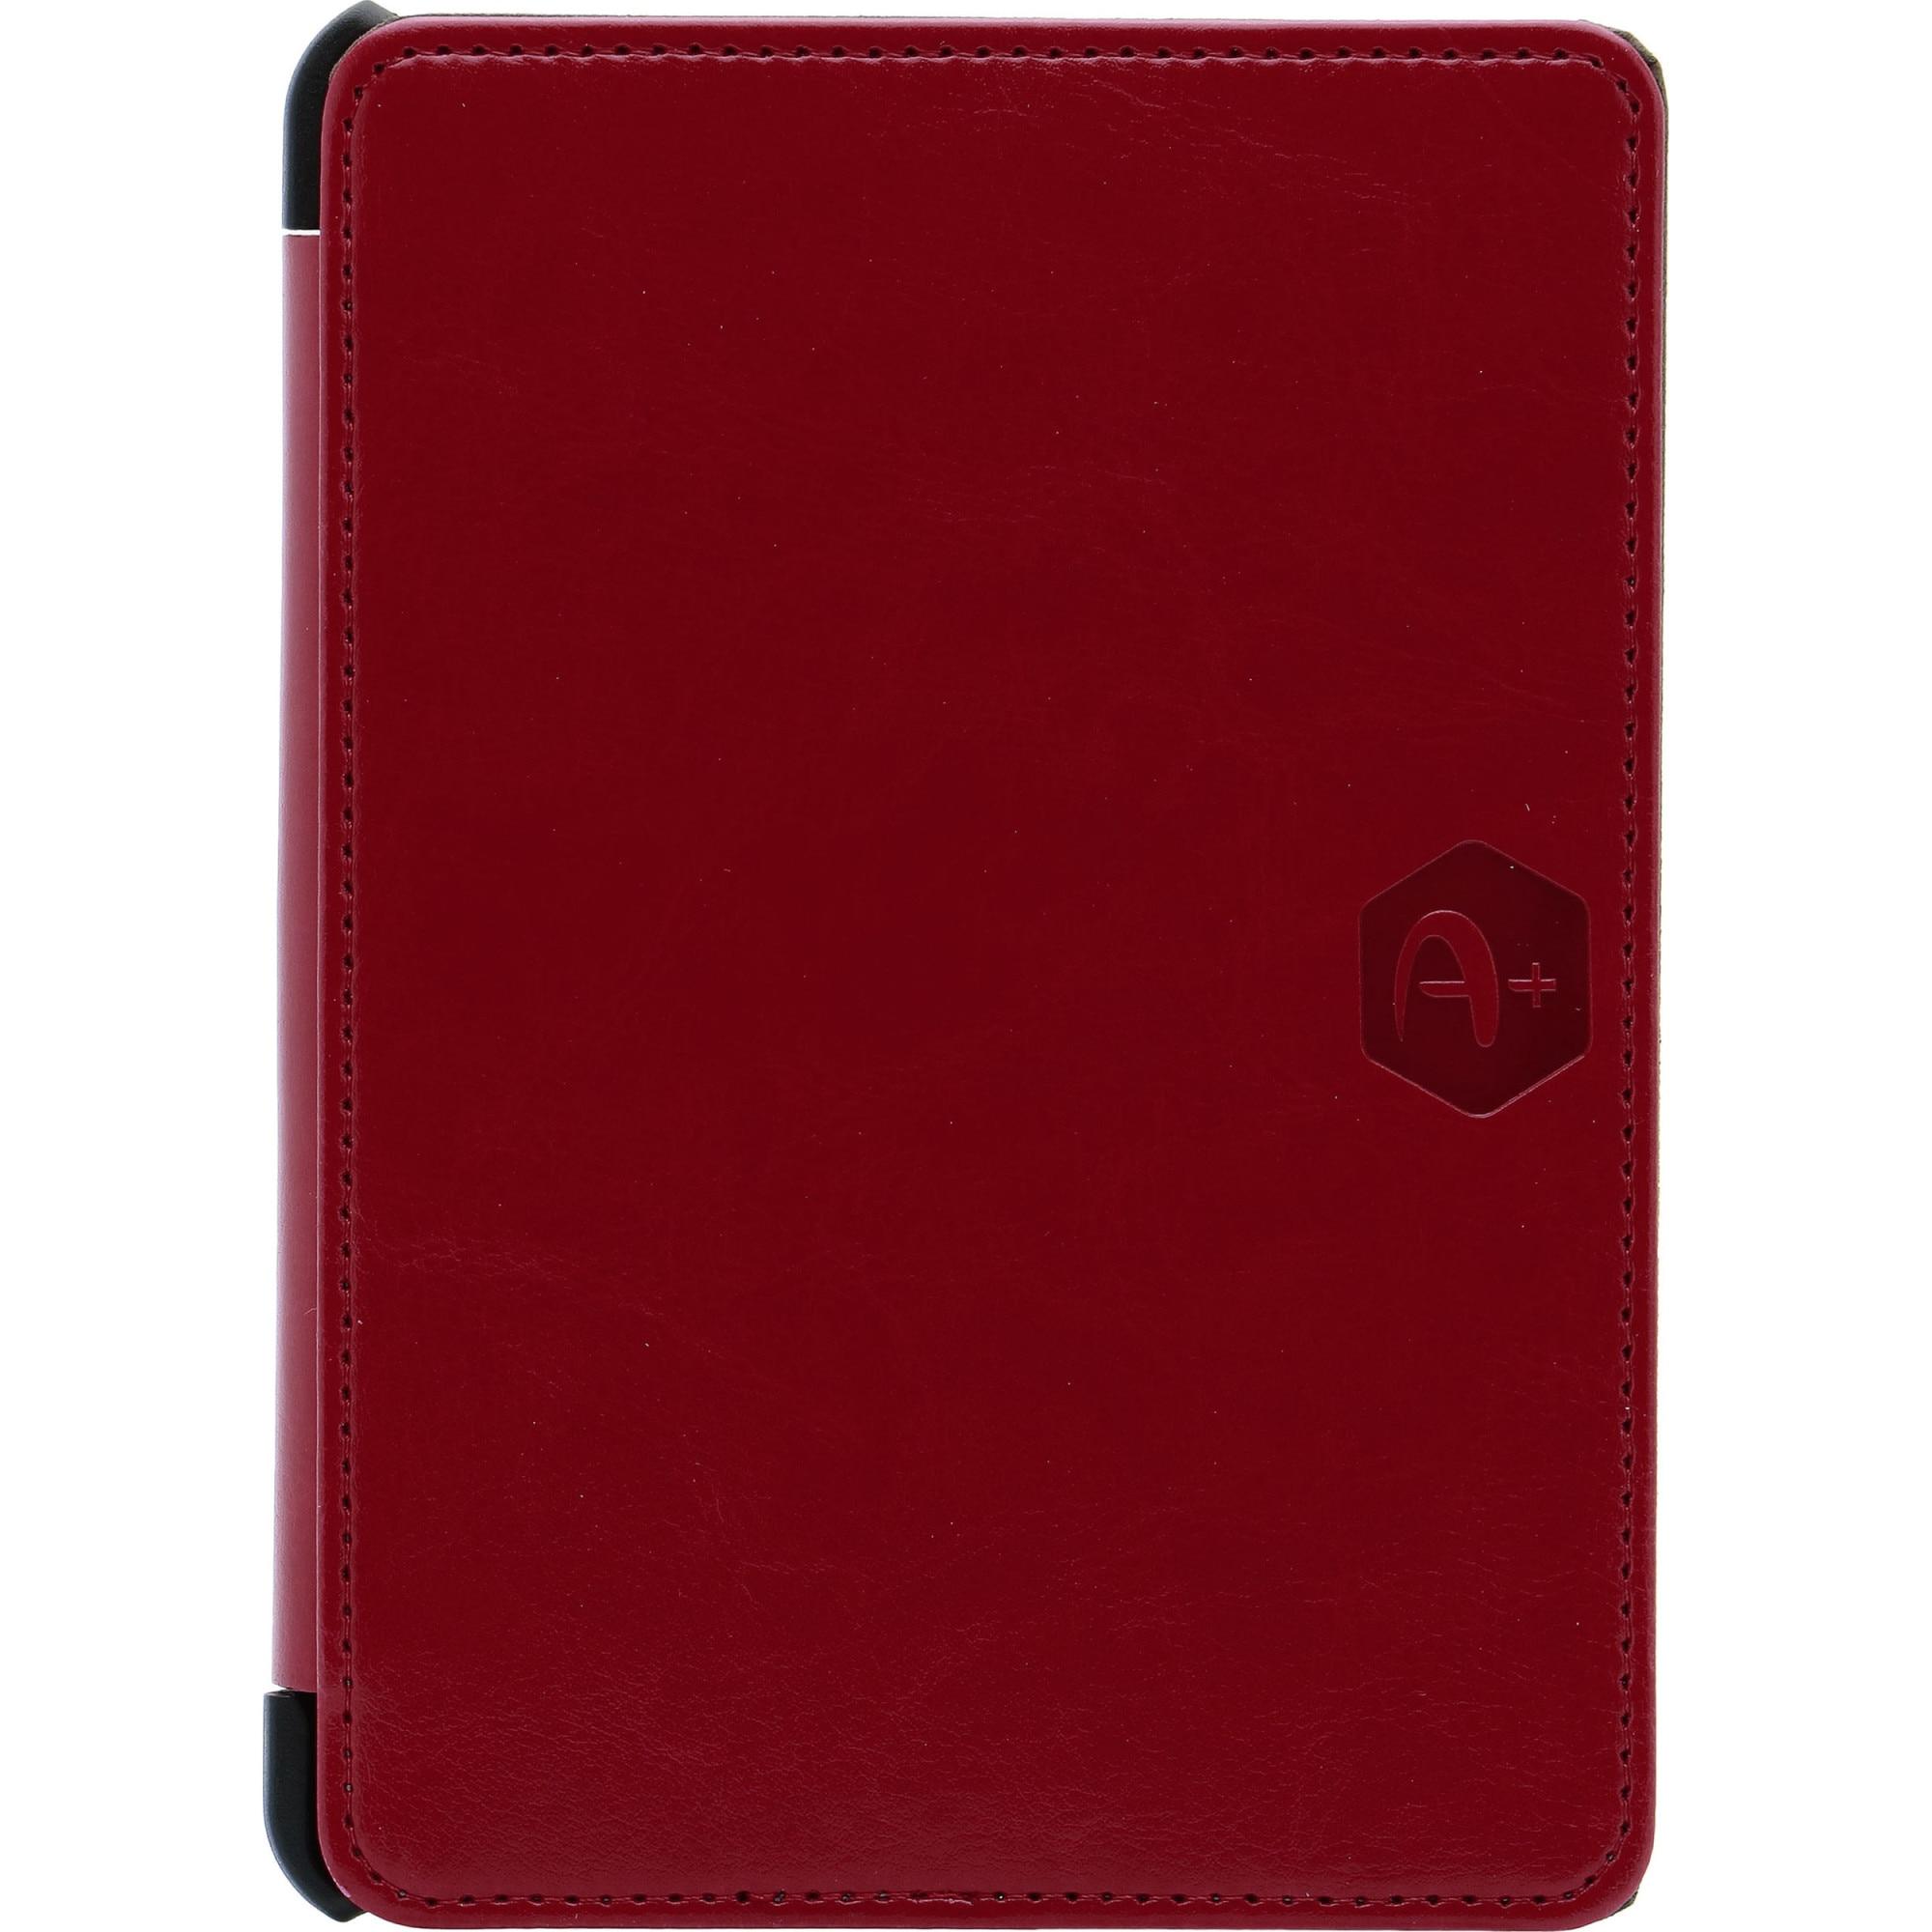 Fotografie Husa de protectie A+ Slim pentru Kindle Paperwhite 4 (10th Generation-2018), Hand red